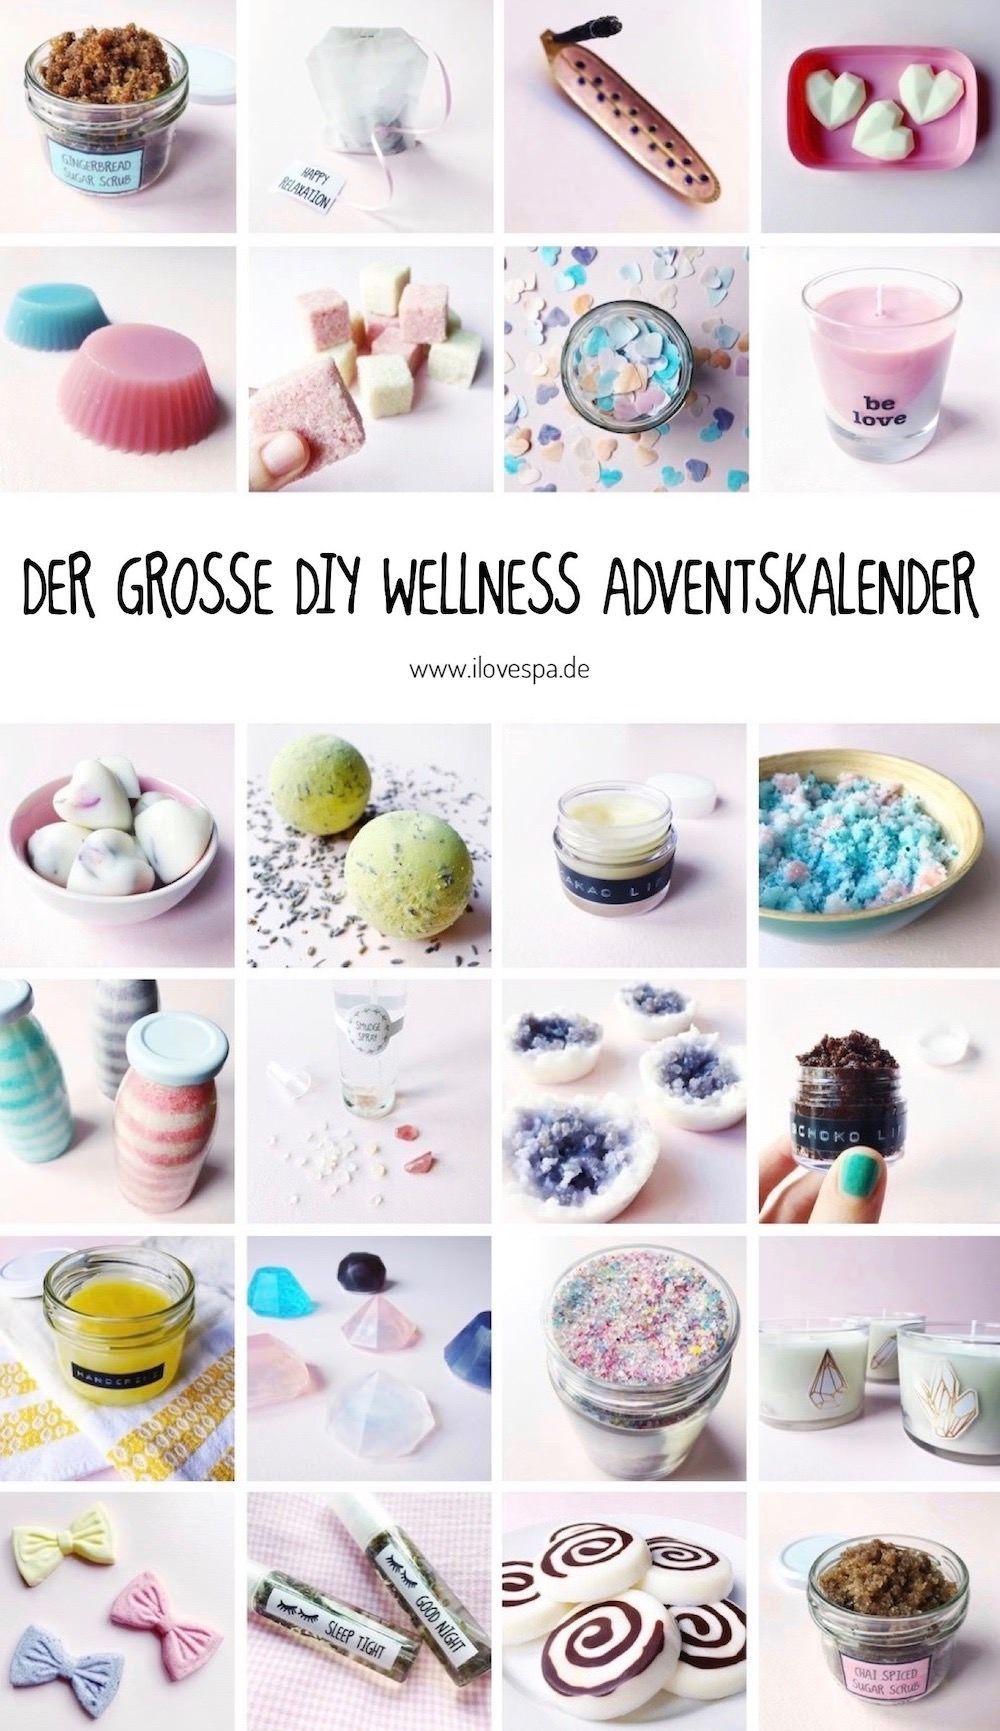 Der große DIY Wellness Adventskalender - 24 DIY Wellness Geschenke